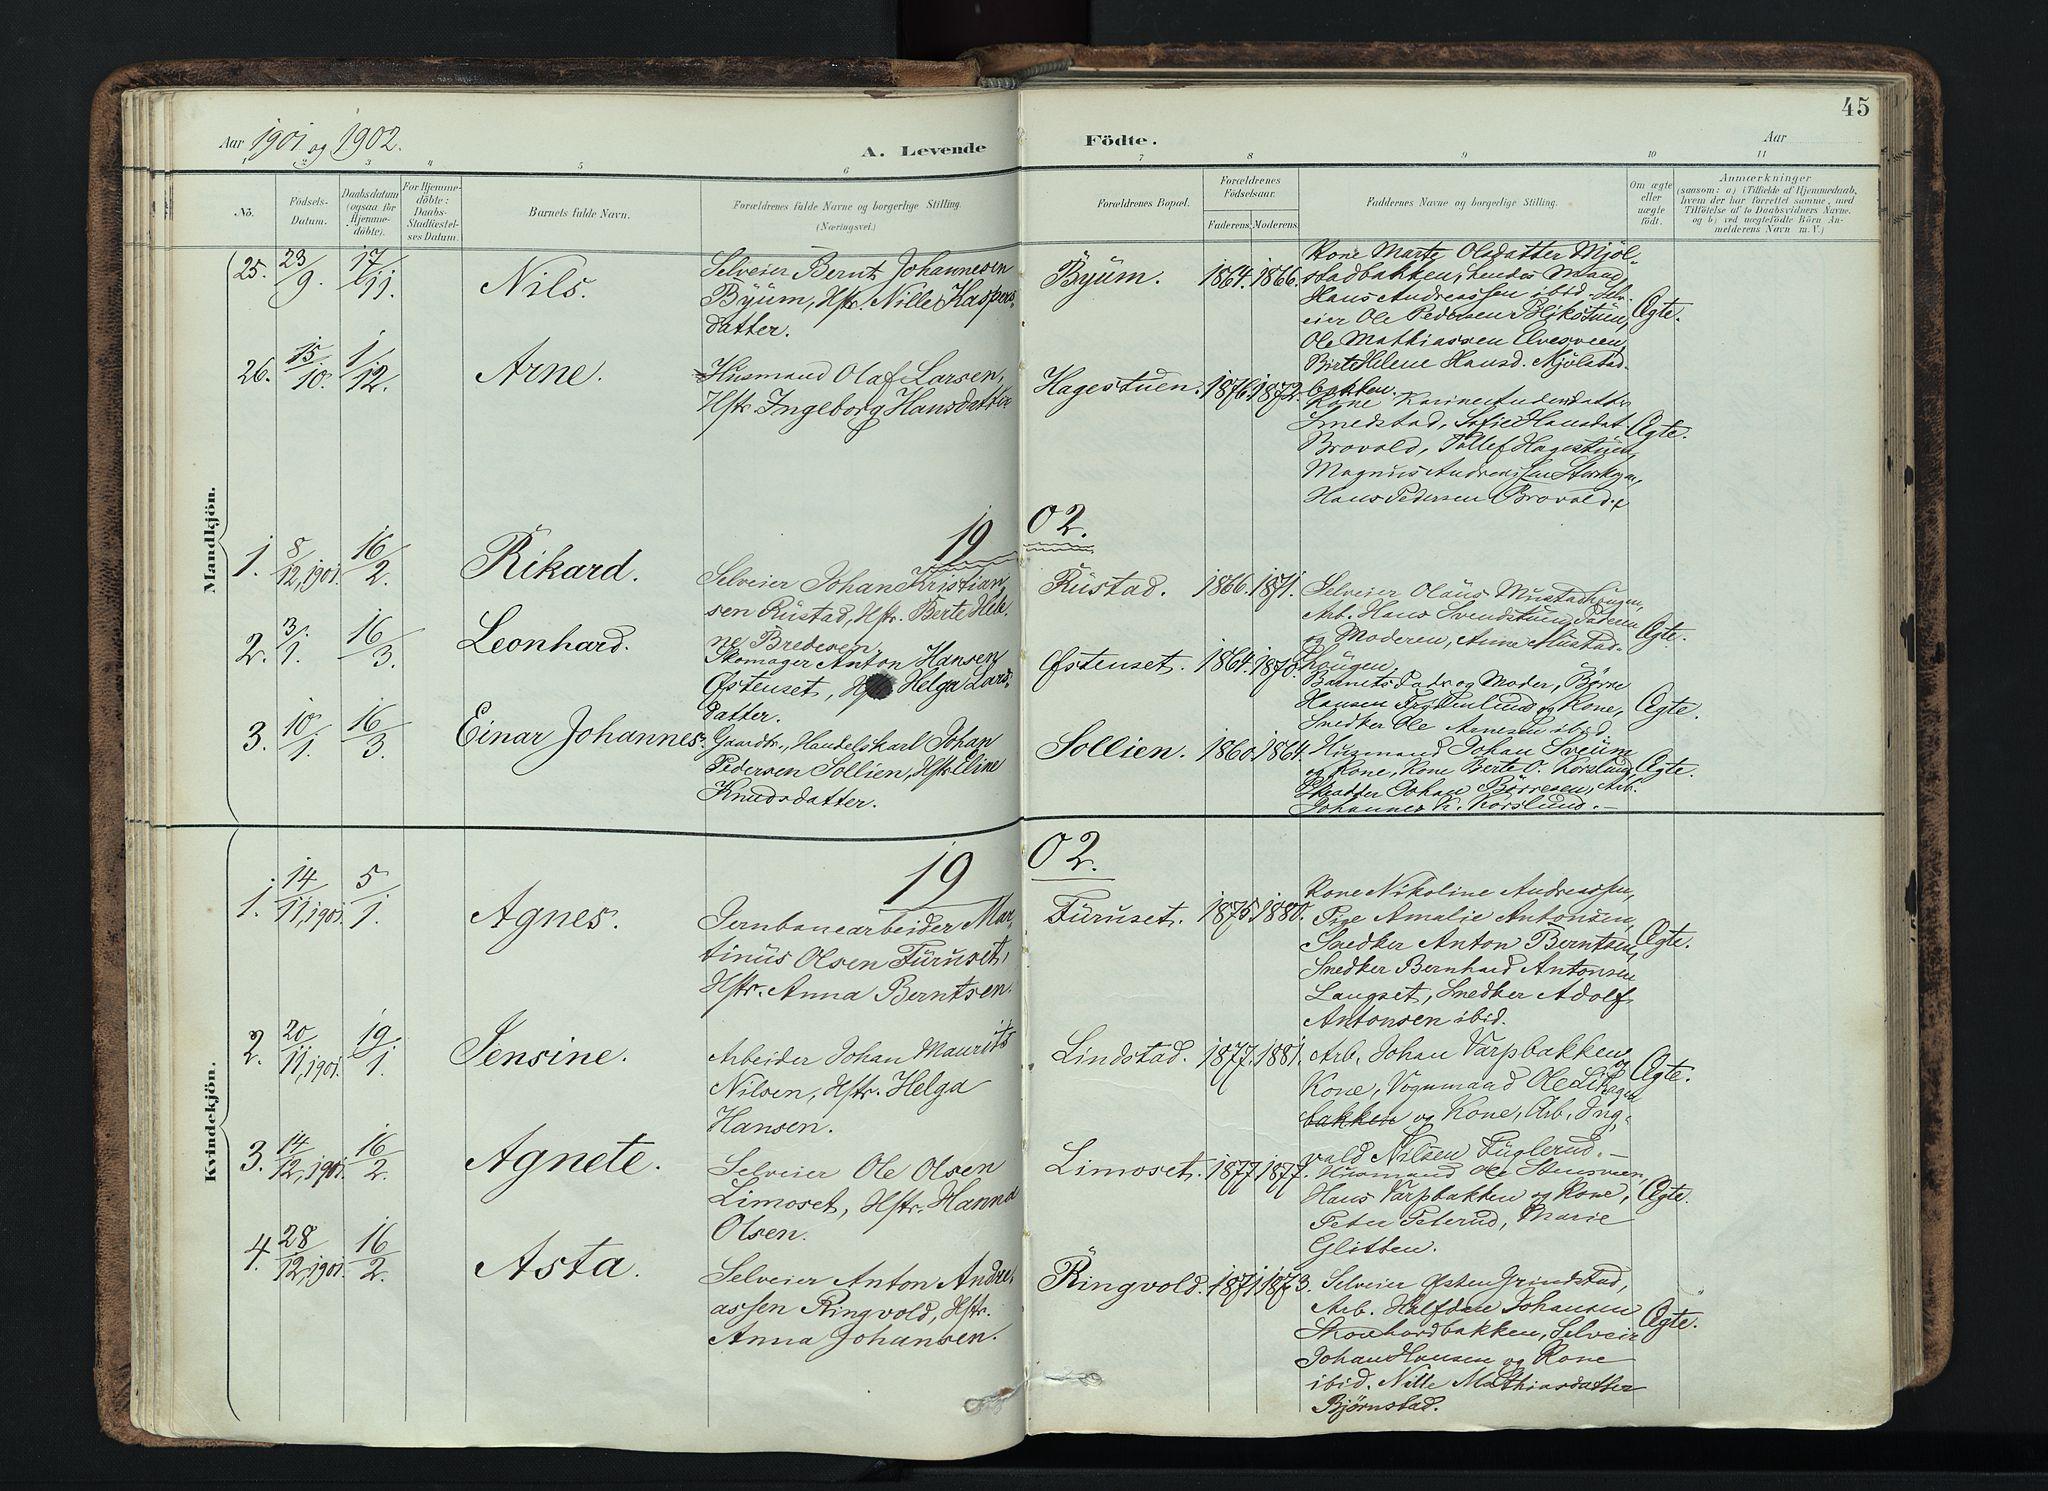 SAH, Vardal prestekontor, H/Ha/Haa/L0019: Ministerialbok nr. 19, 1893-1907, s. 45